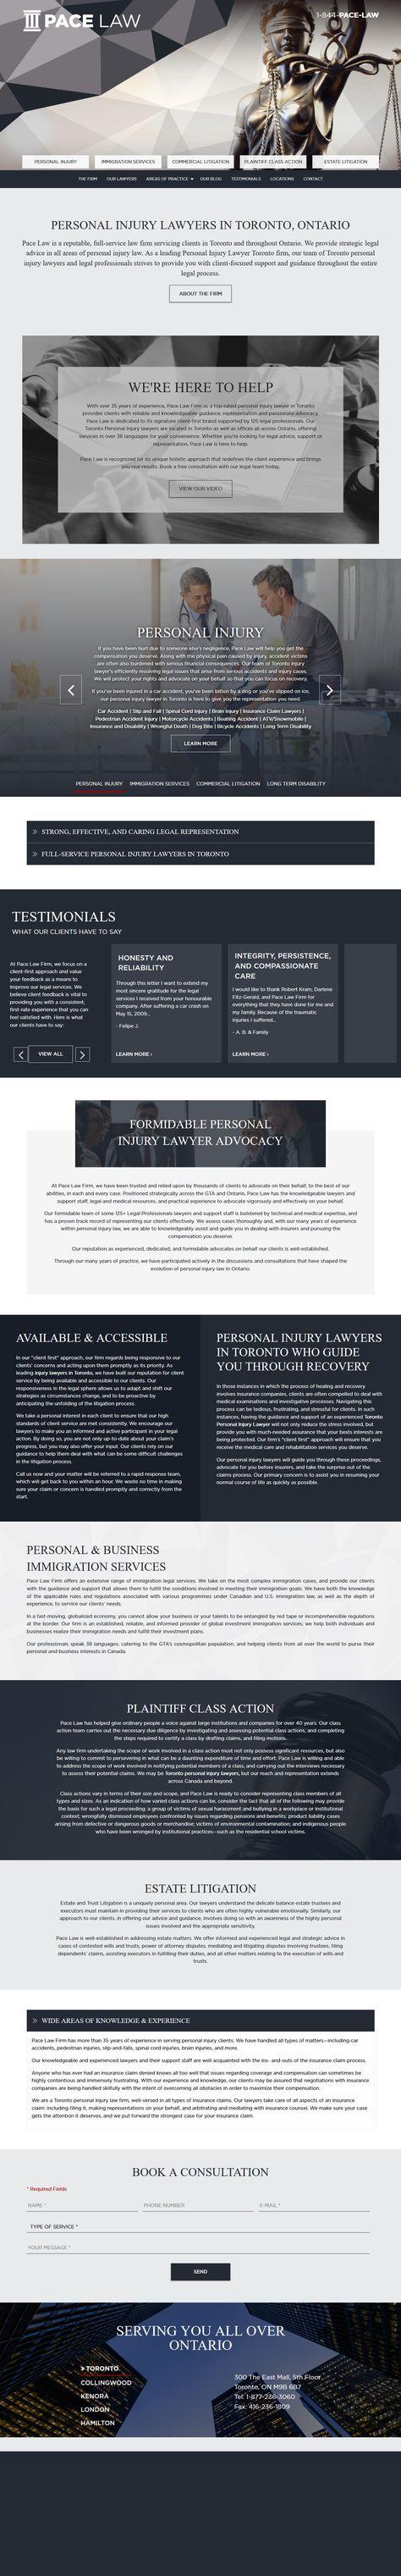 Personal Injury Lawyers Toronto | Ontario's Top-Rated Personal Injury Lawyer